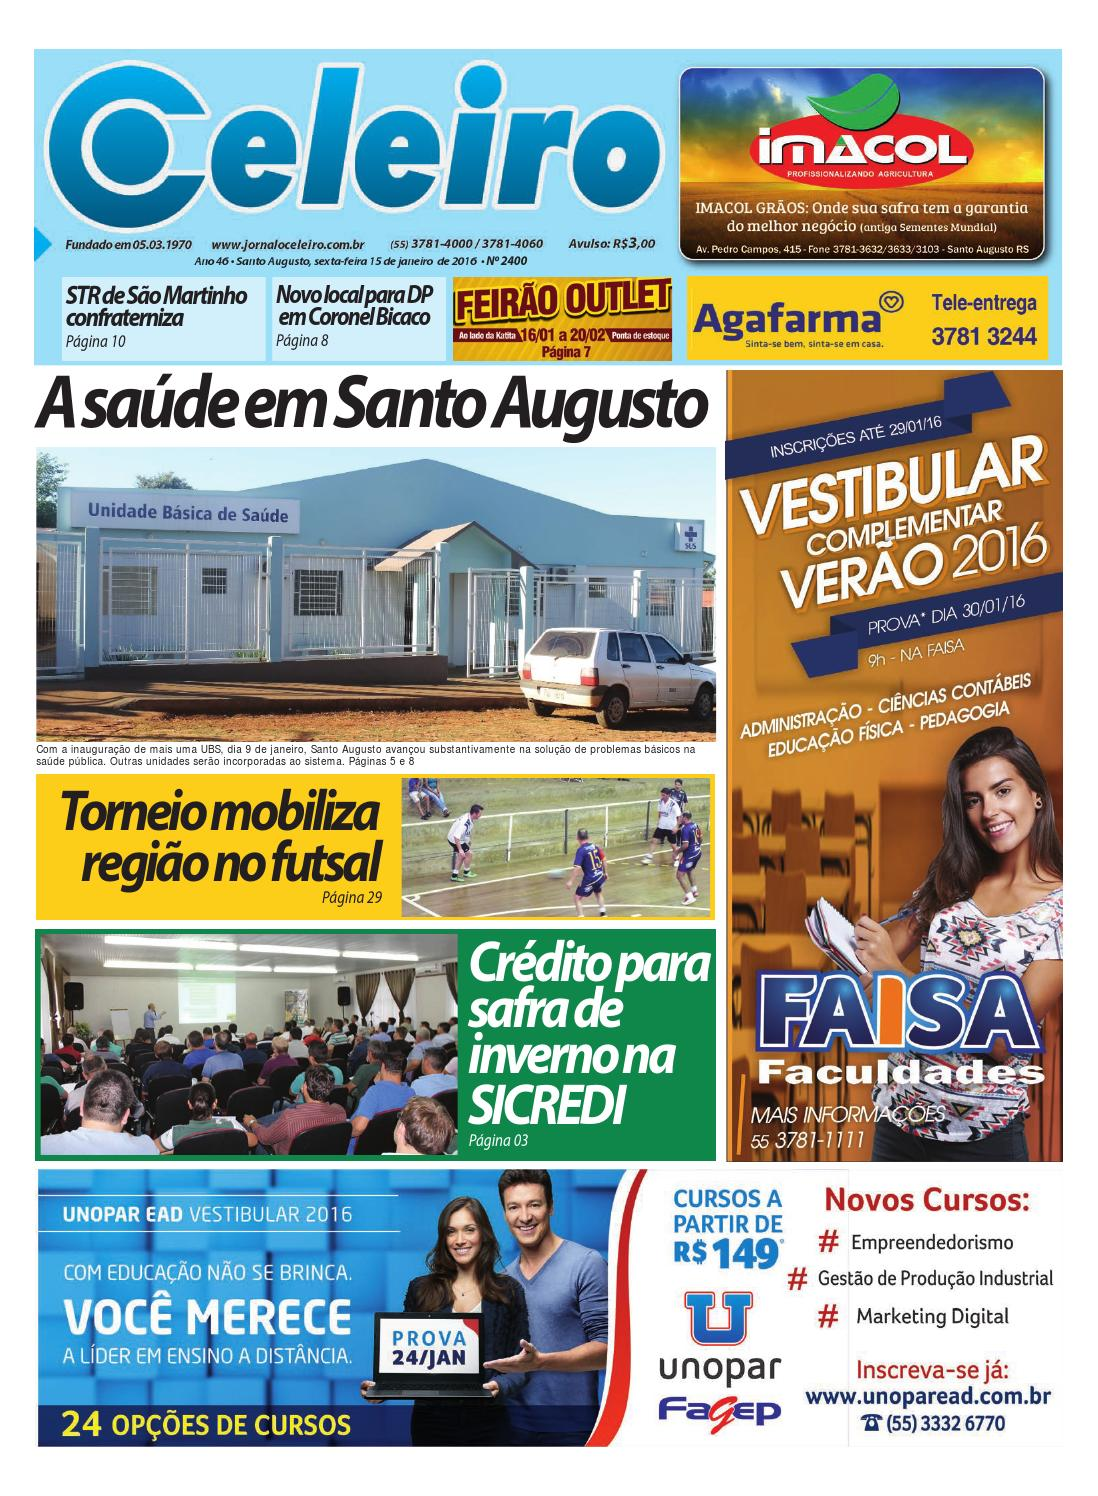 Binder1 by O celeiro Jornal - issuu a5ee2c69872c9